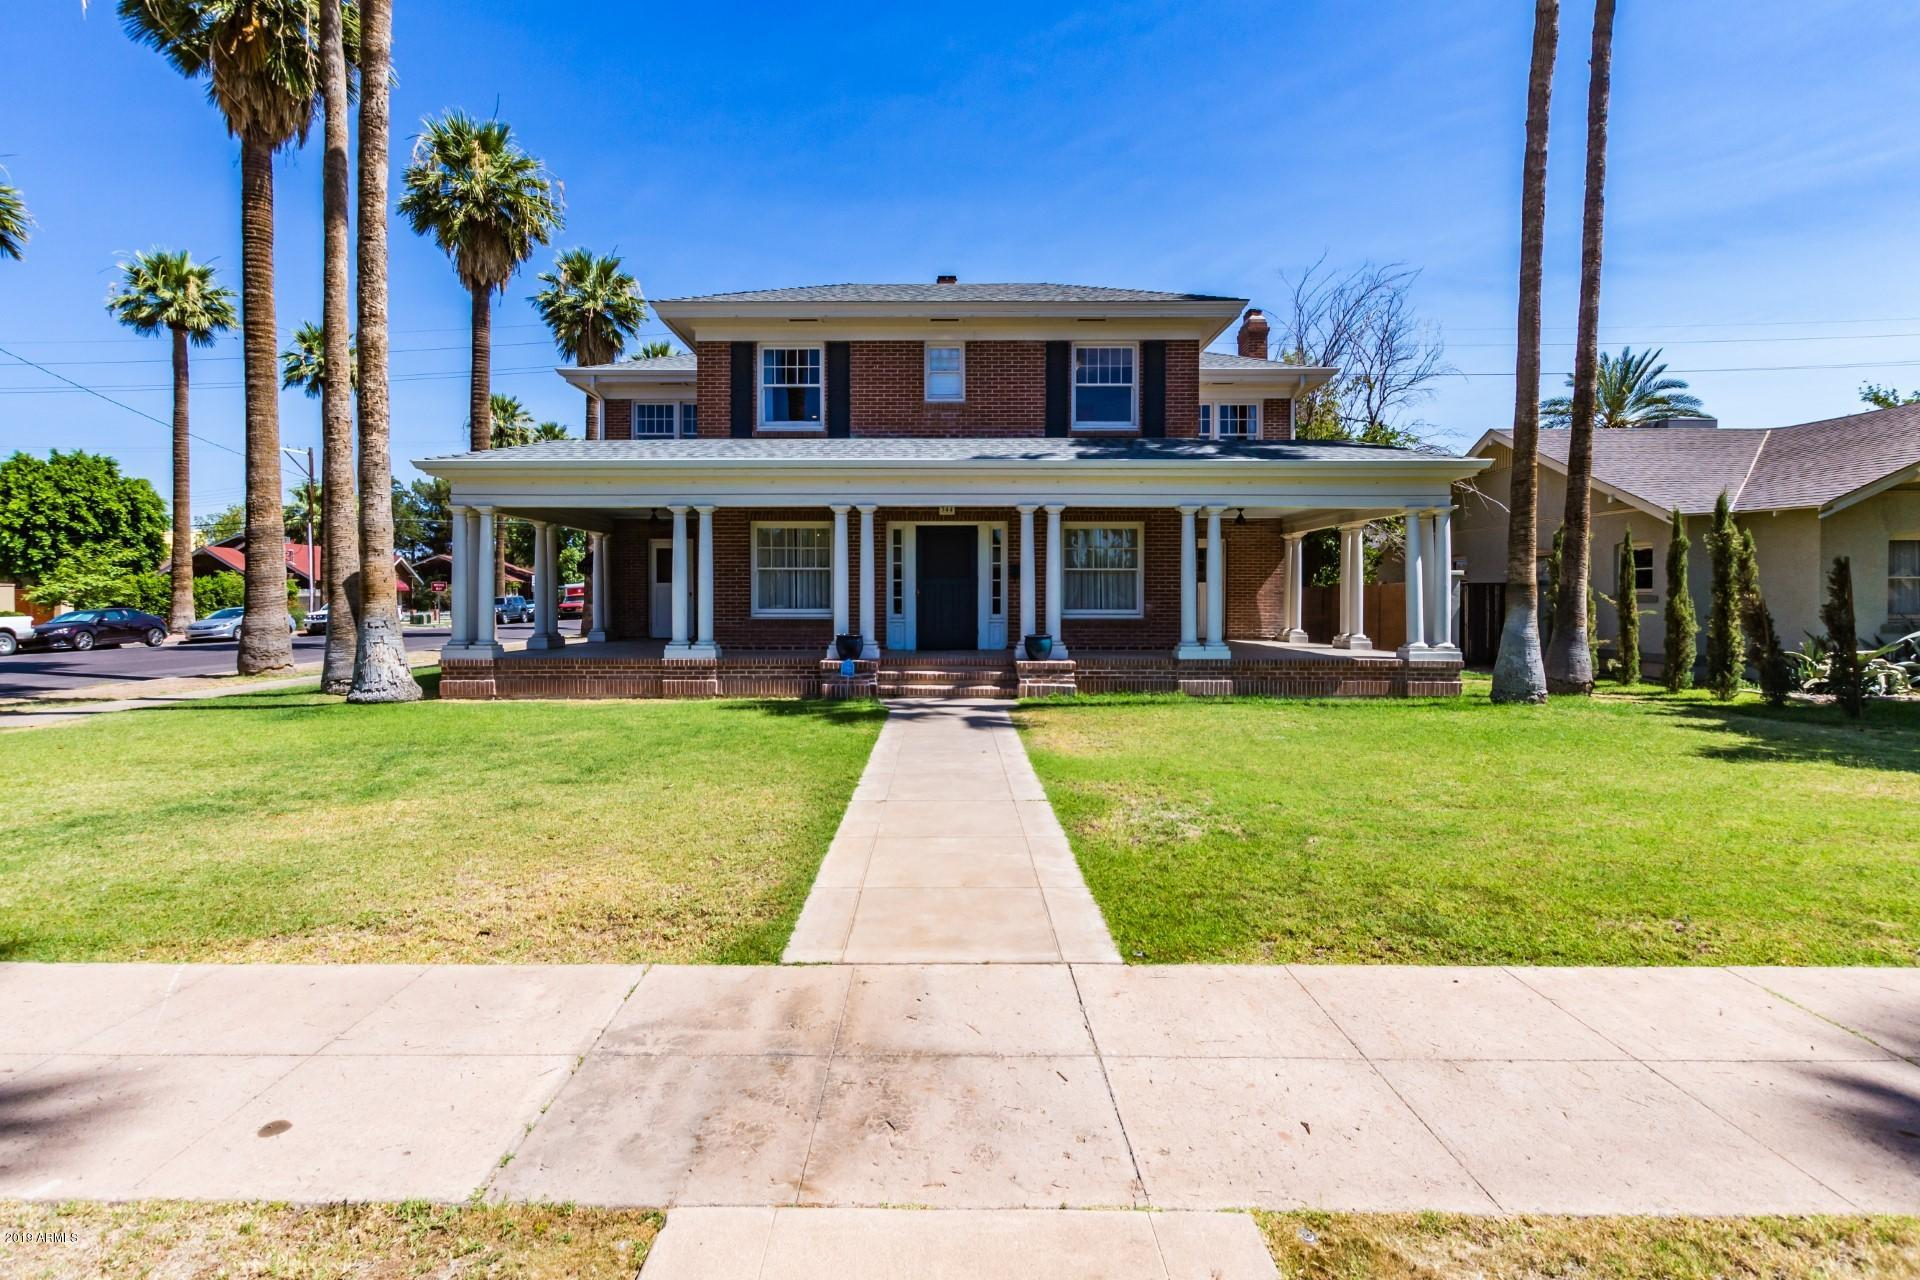 Photo of 344 W LYNWOOD Street, Phoenix, AZ 85003